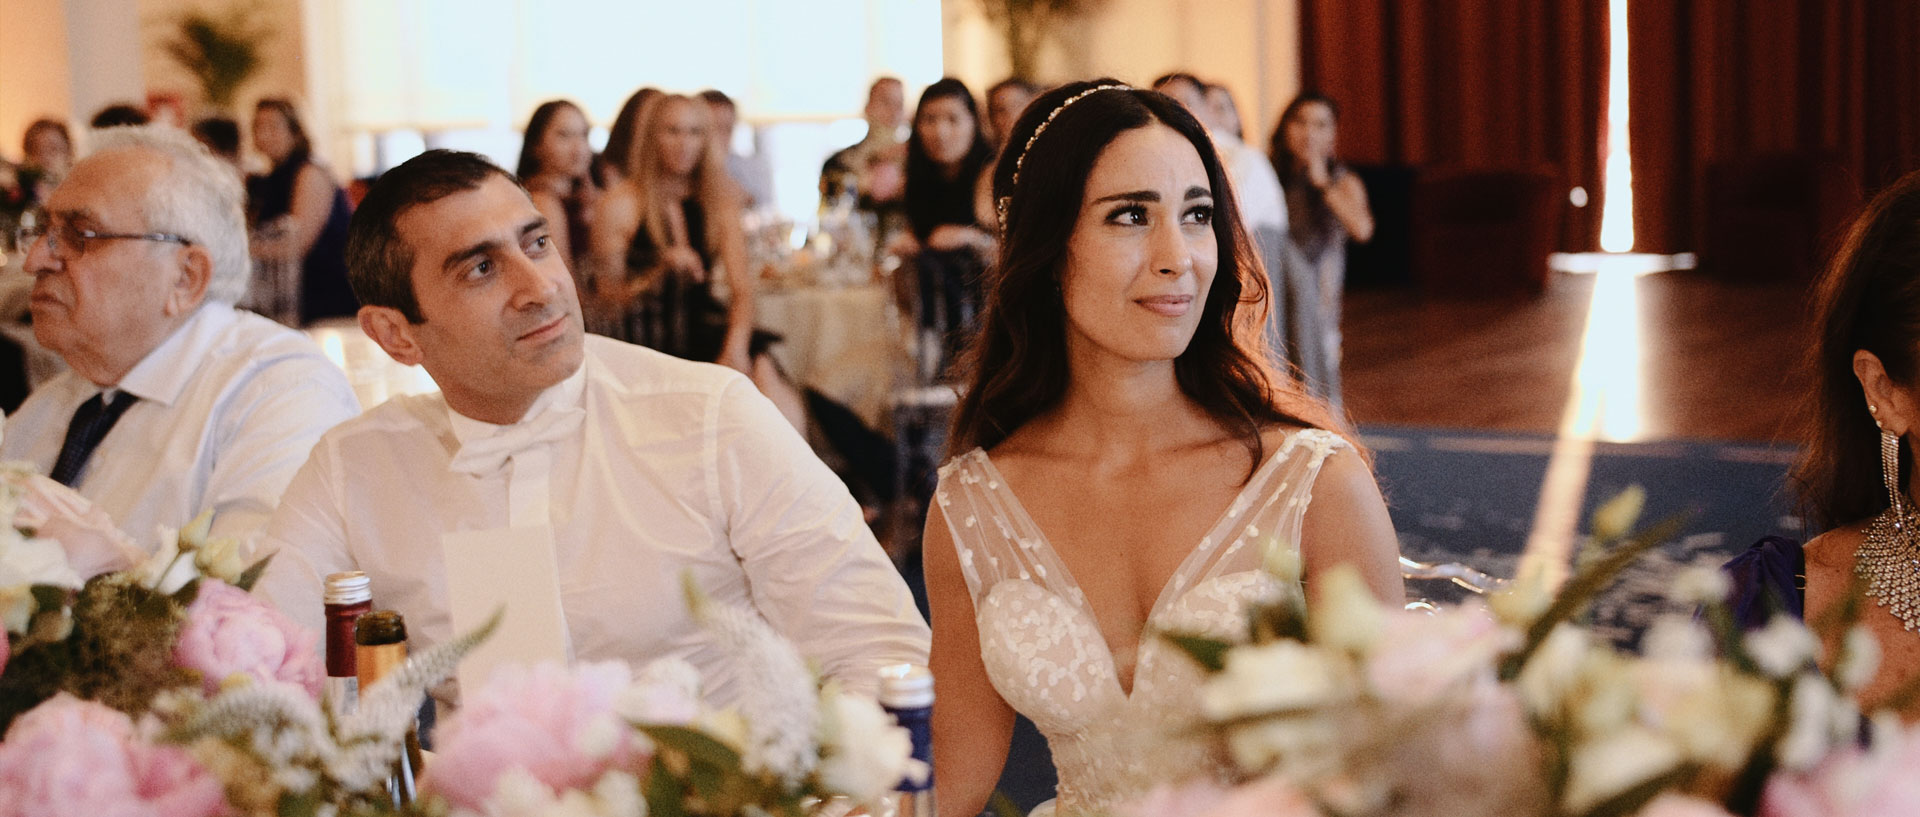 Natasha & Jad Wedding - Casino Biarritz (29).jpg